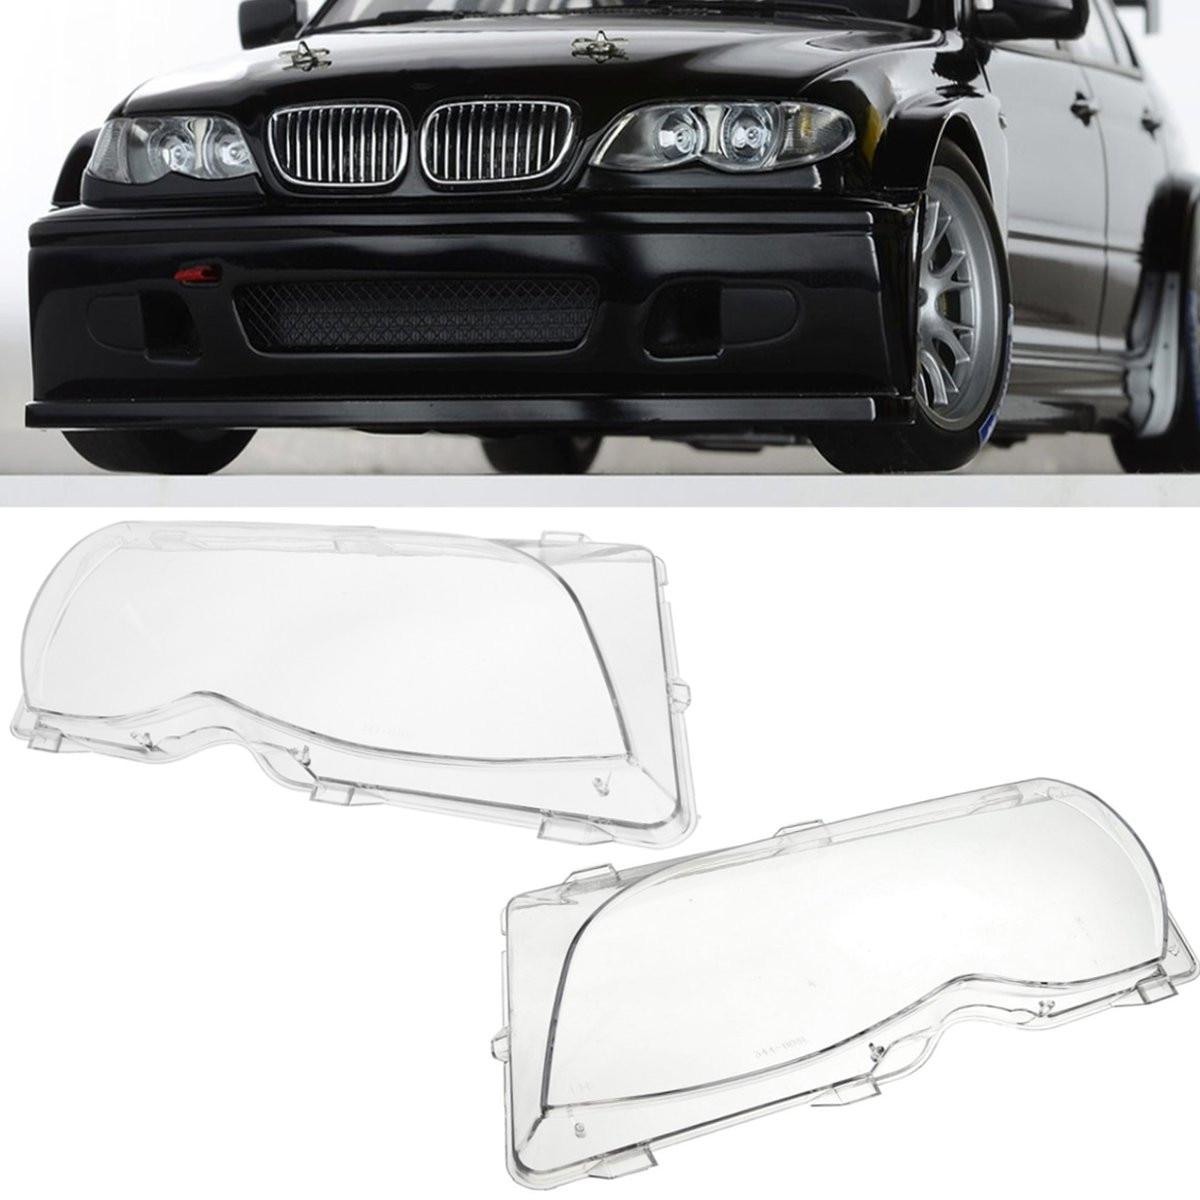 Left/Right Side Car Headlight Lens Covers Head Lamp Cover For BMW E46 320i/325i/325xi 4DR Sedan 2001 2002 2003 2004 2005 2006Left/Right Side Car Headlight Lens Covers Head Lamp Cover For BMW E46 320i/325i/325xi 4DR Sedan 2001 2002 2003 2004 2005 2006